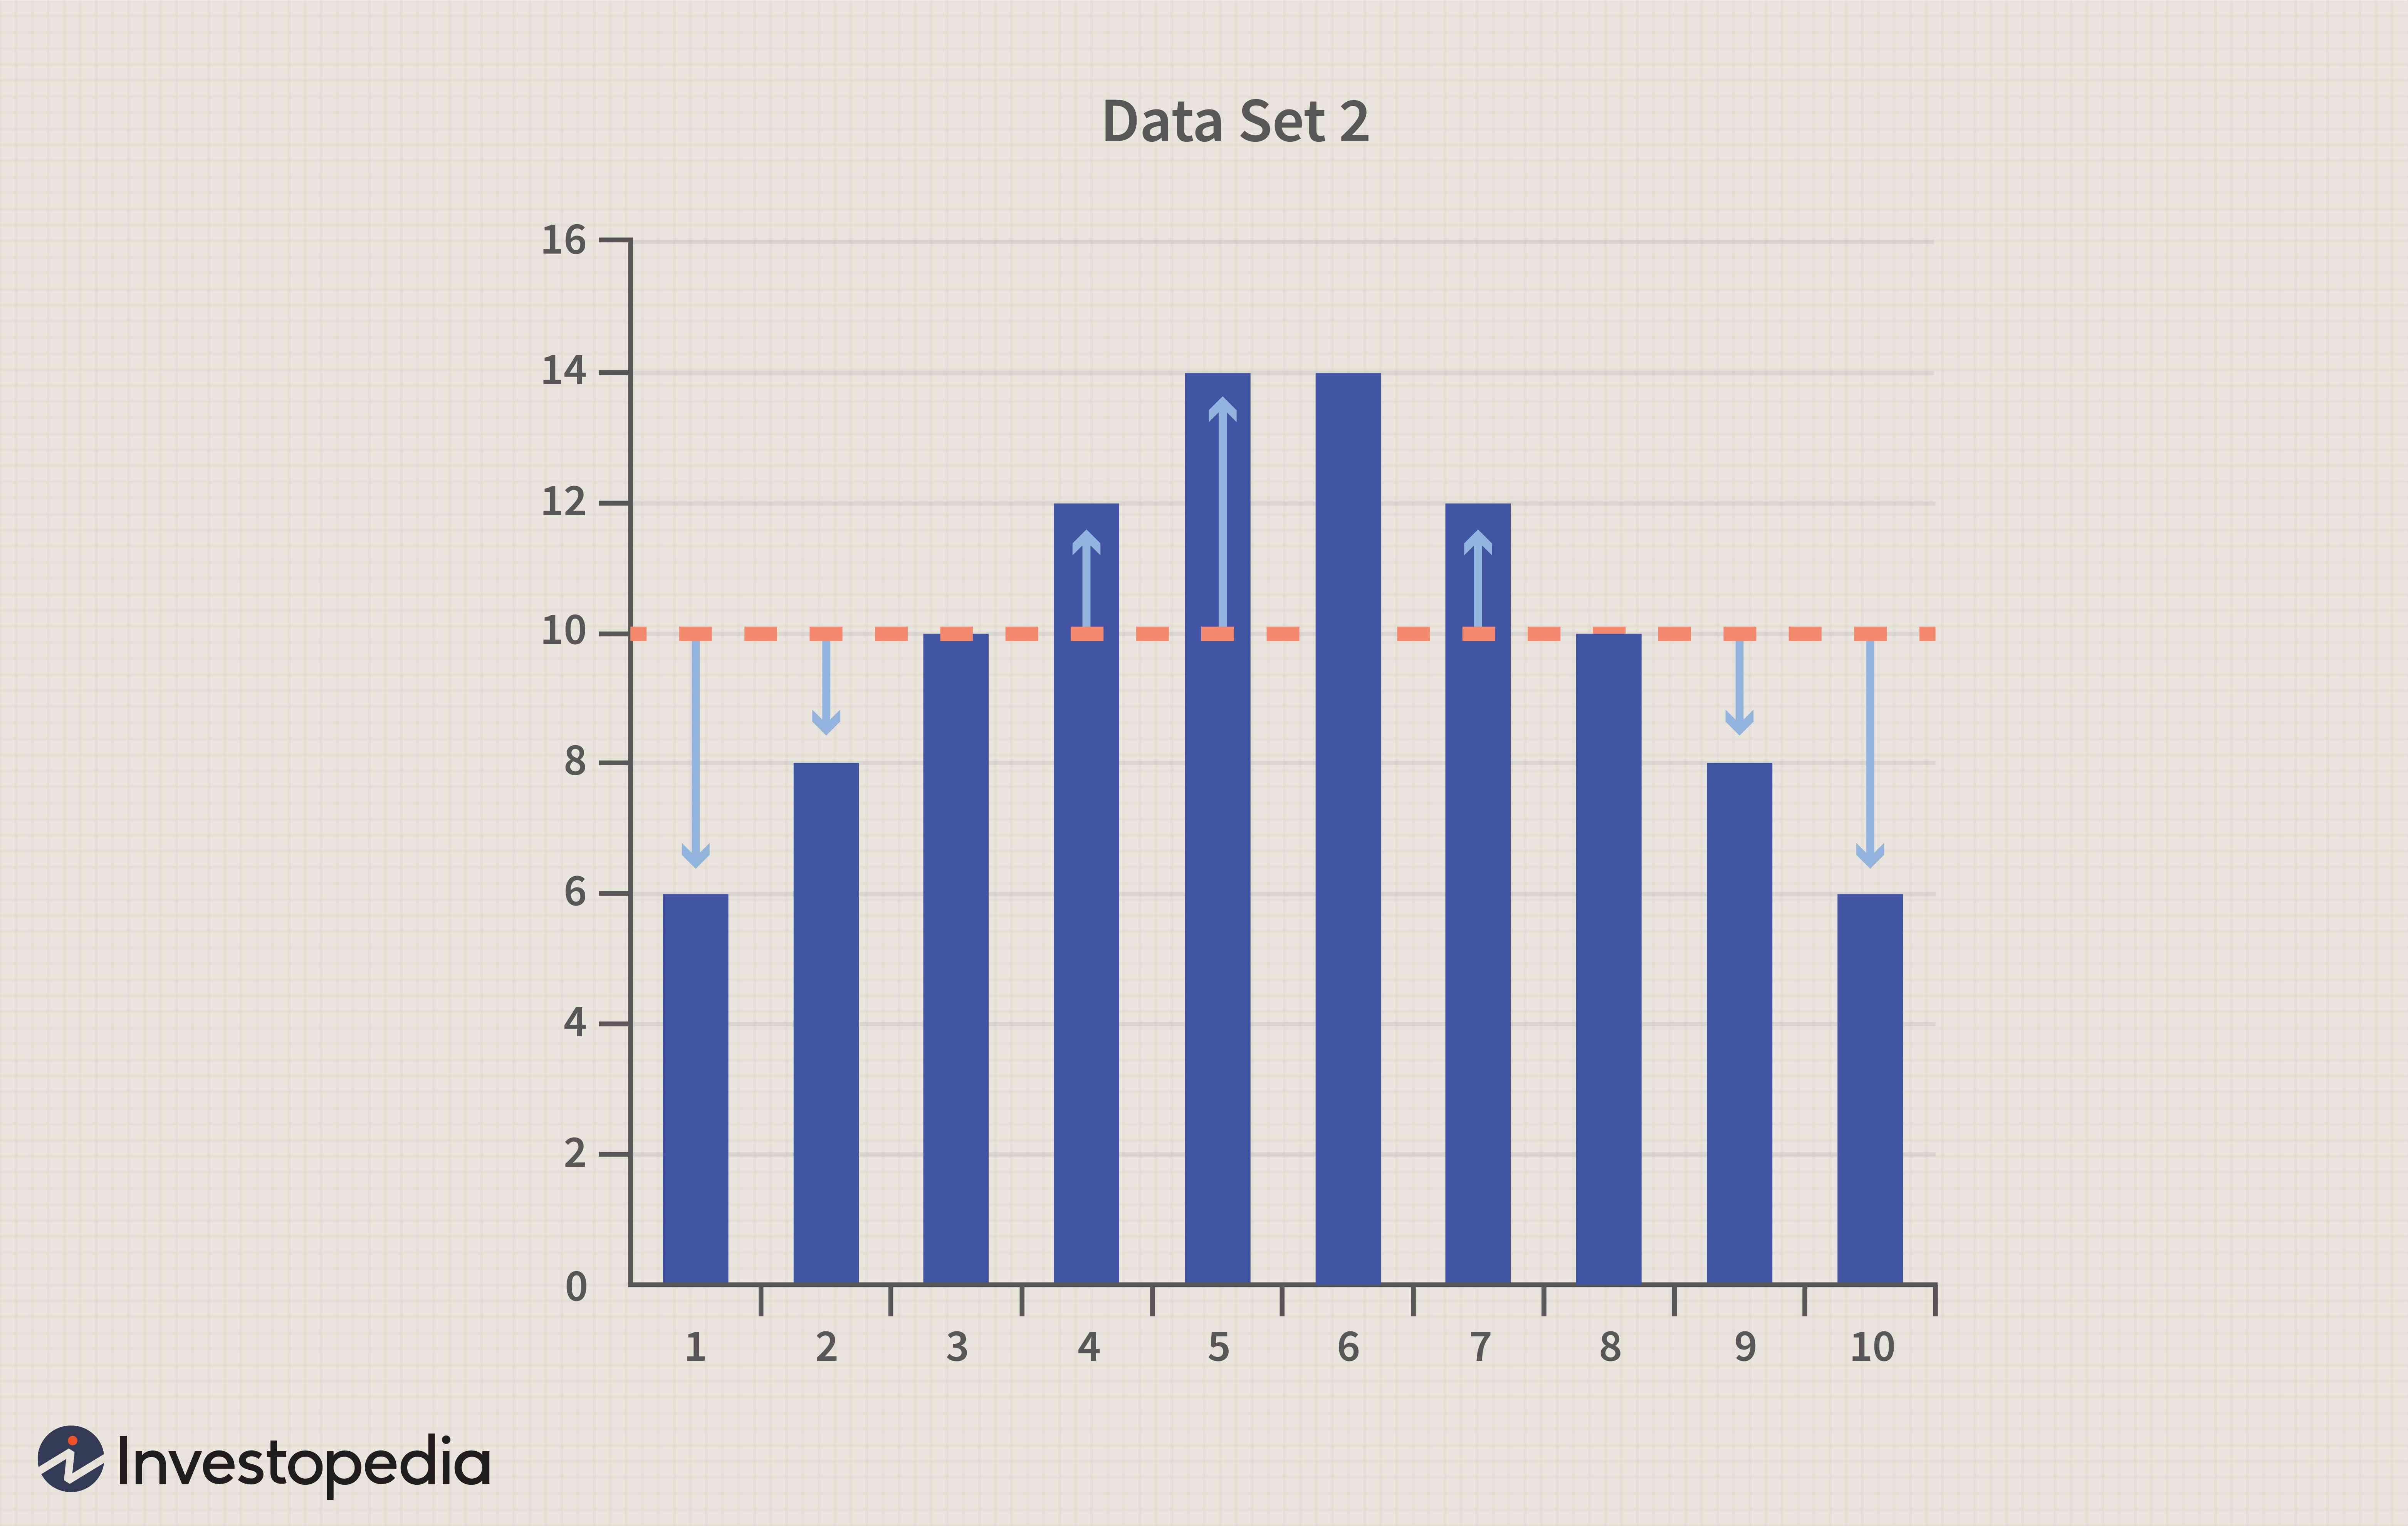 Data set 2